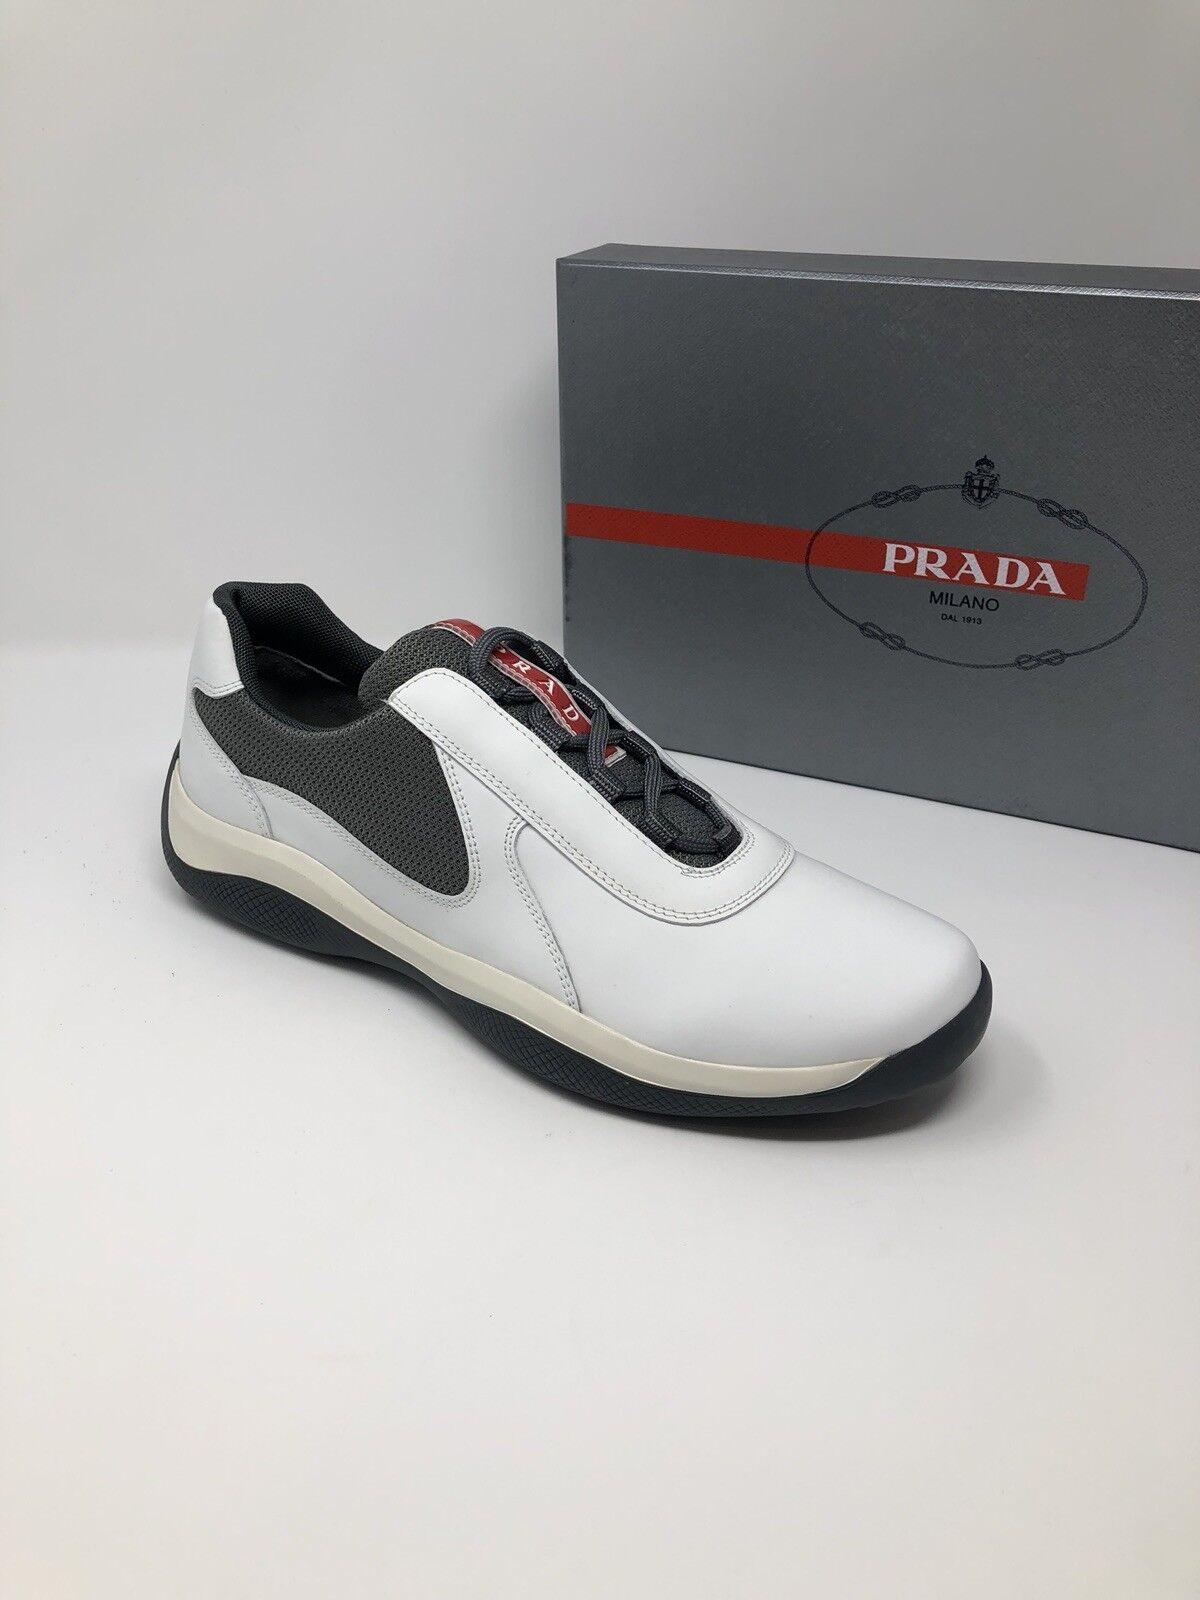 New PRADA Mens White Sneakers shoes Size 8.5 US 7.5 EU